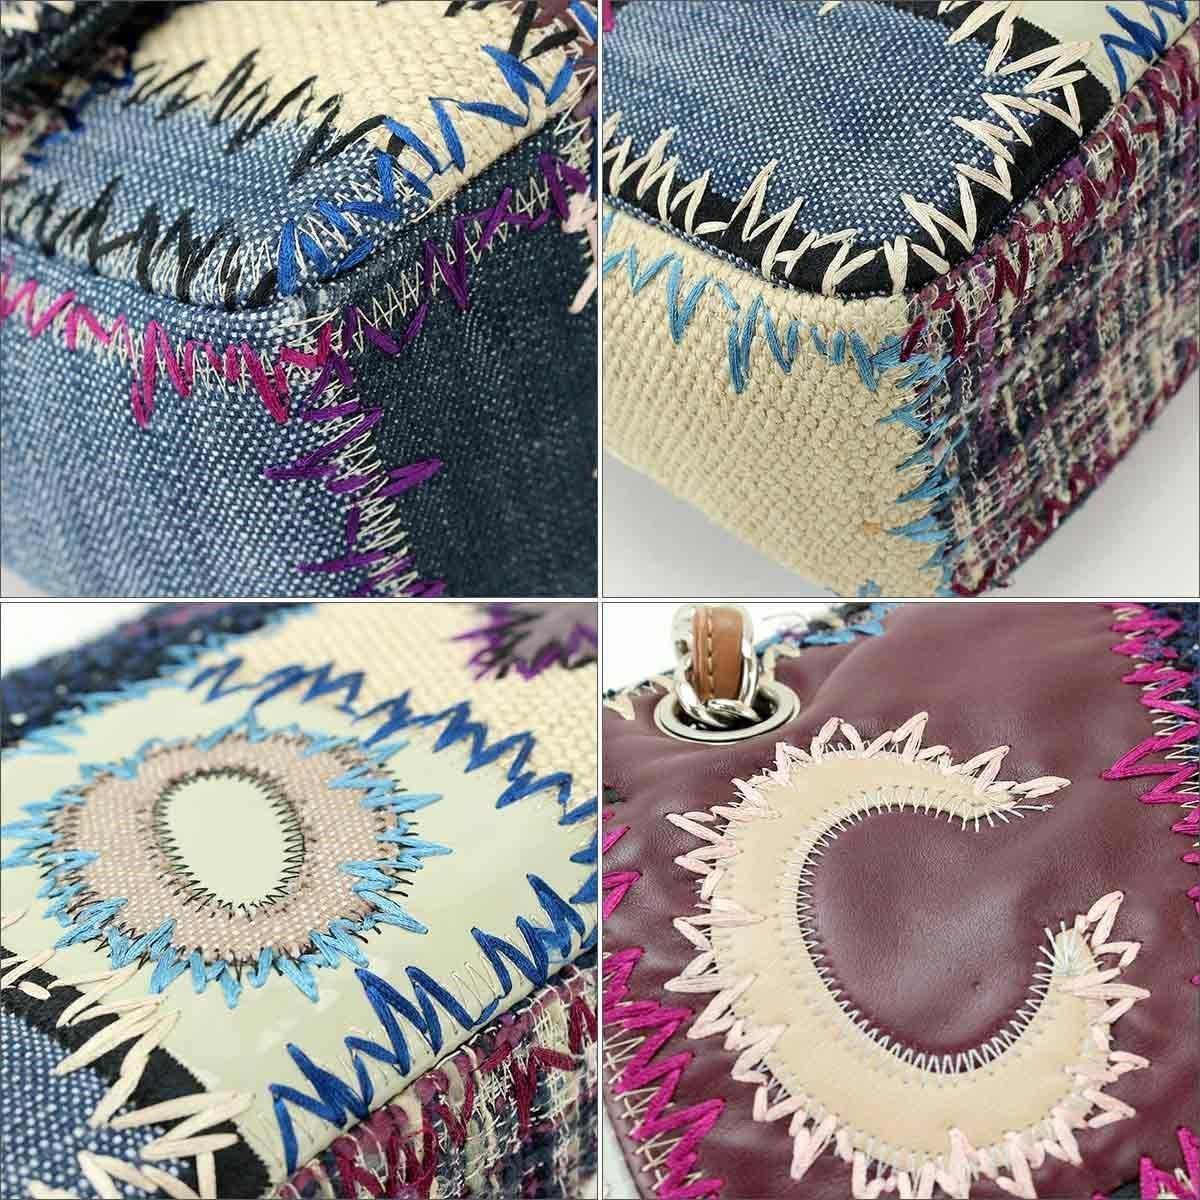 f25be151608f Chanel Patchwork Chain Shoulder Bag Denim Leather A49129 90038191 ...